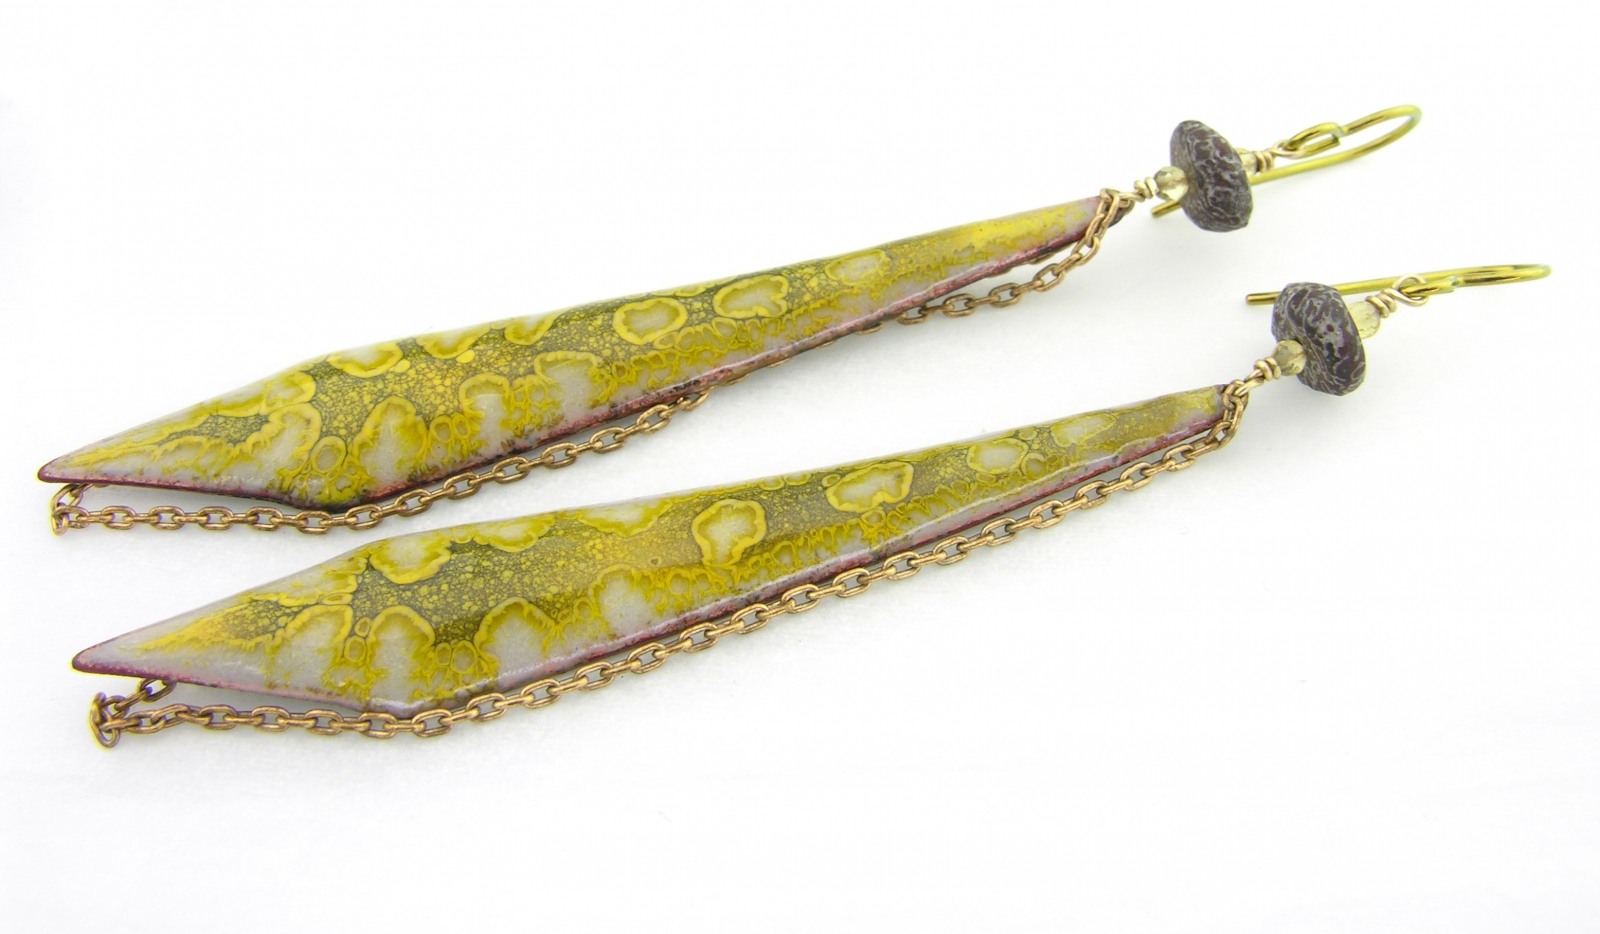 Relics Earrings - dinosaur bone, citrine, enamel on brass and niobium